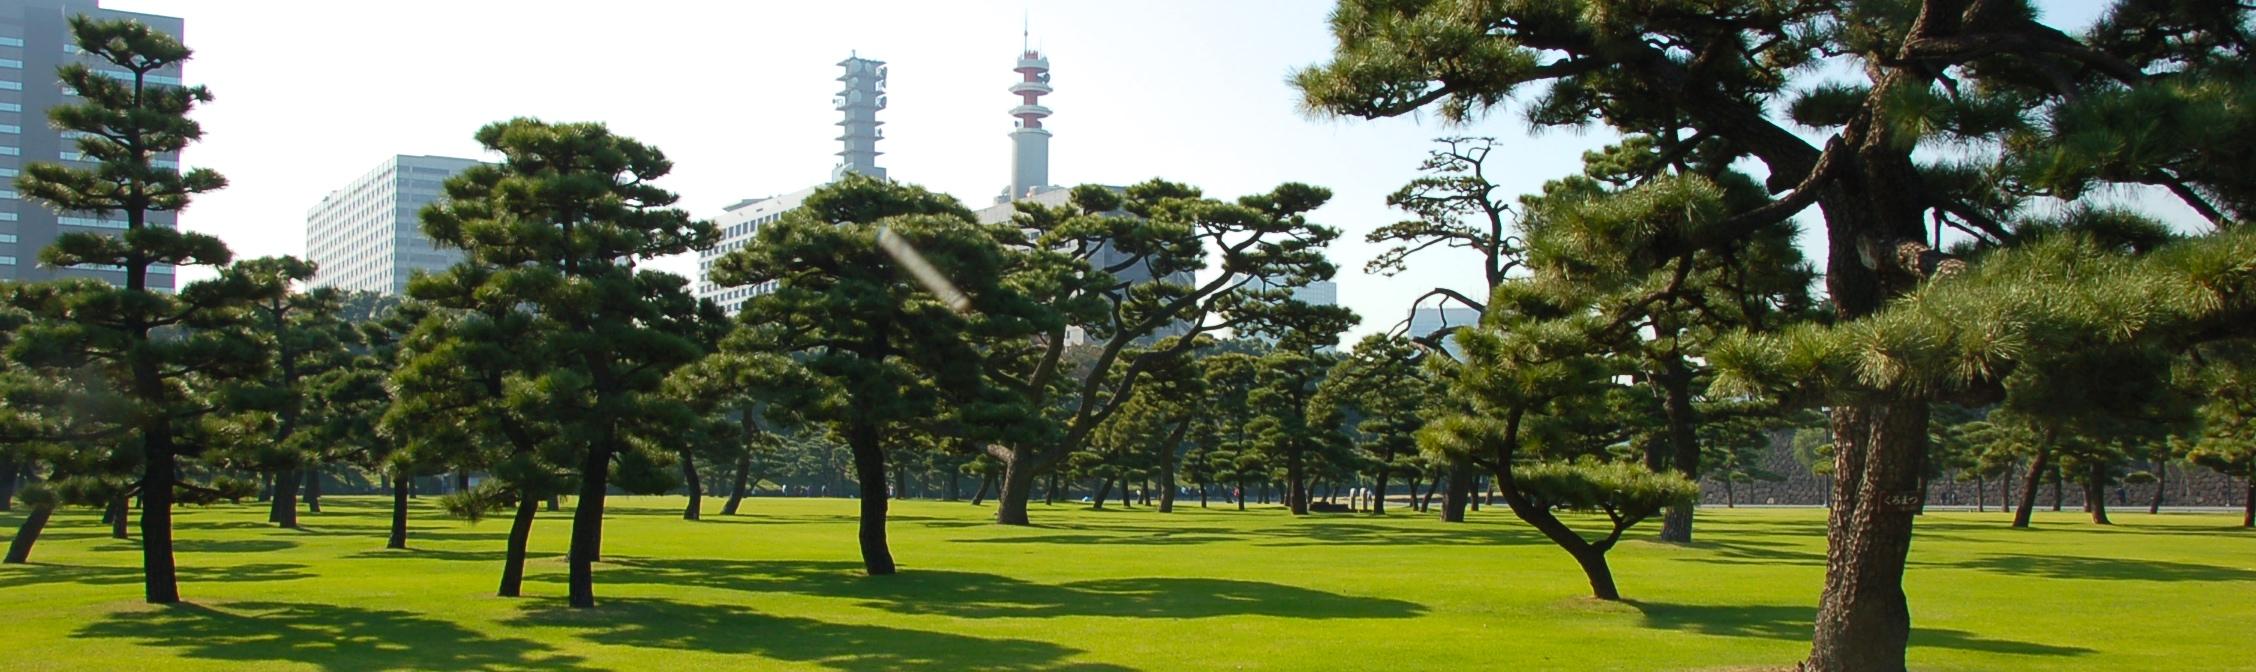 Parque Hibiya, Kioto